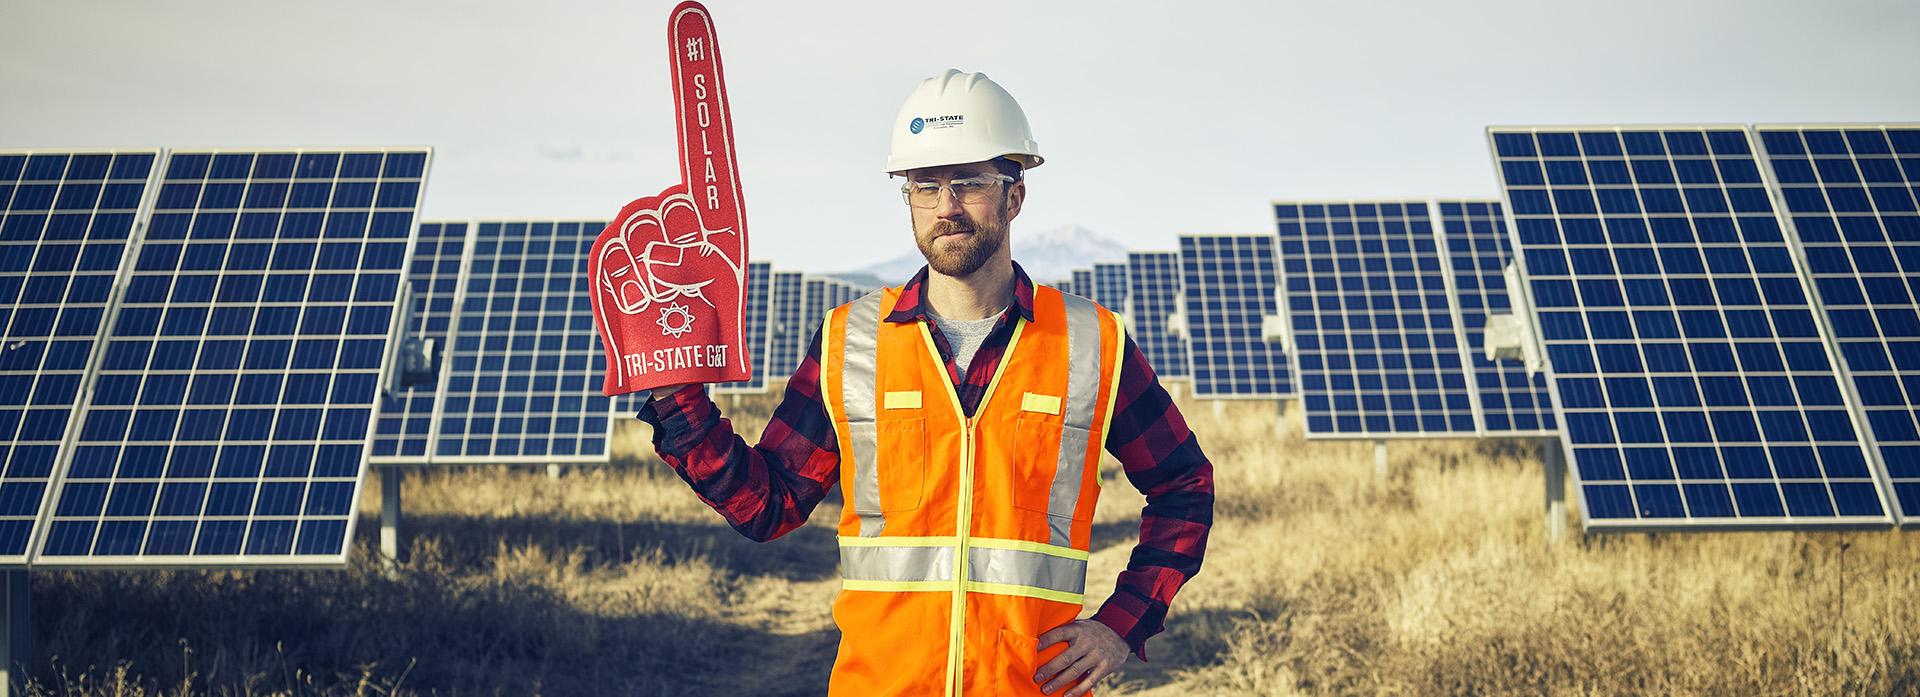 https://tristate.coop/sites/tristate/files/revslider/image/Randy-solar-hero-030819.jpg